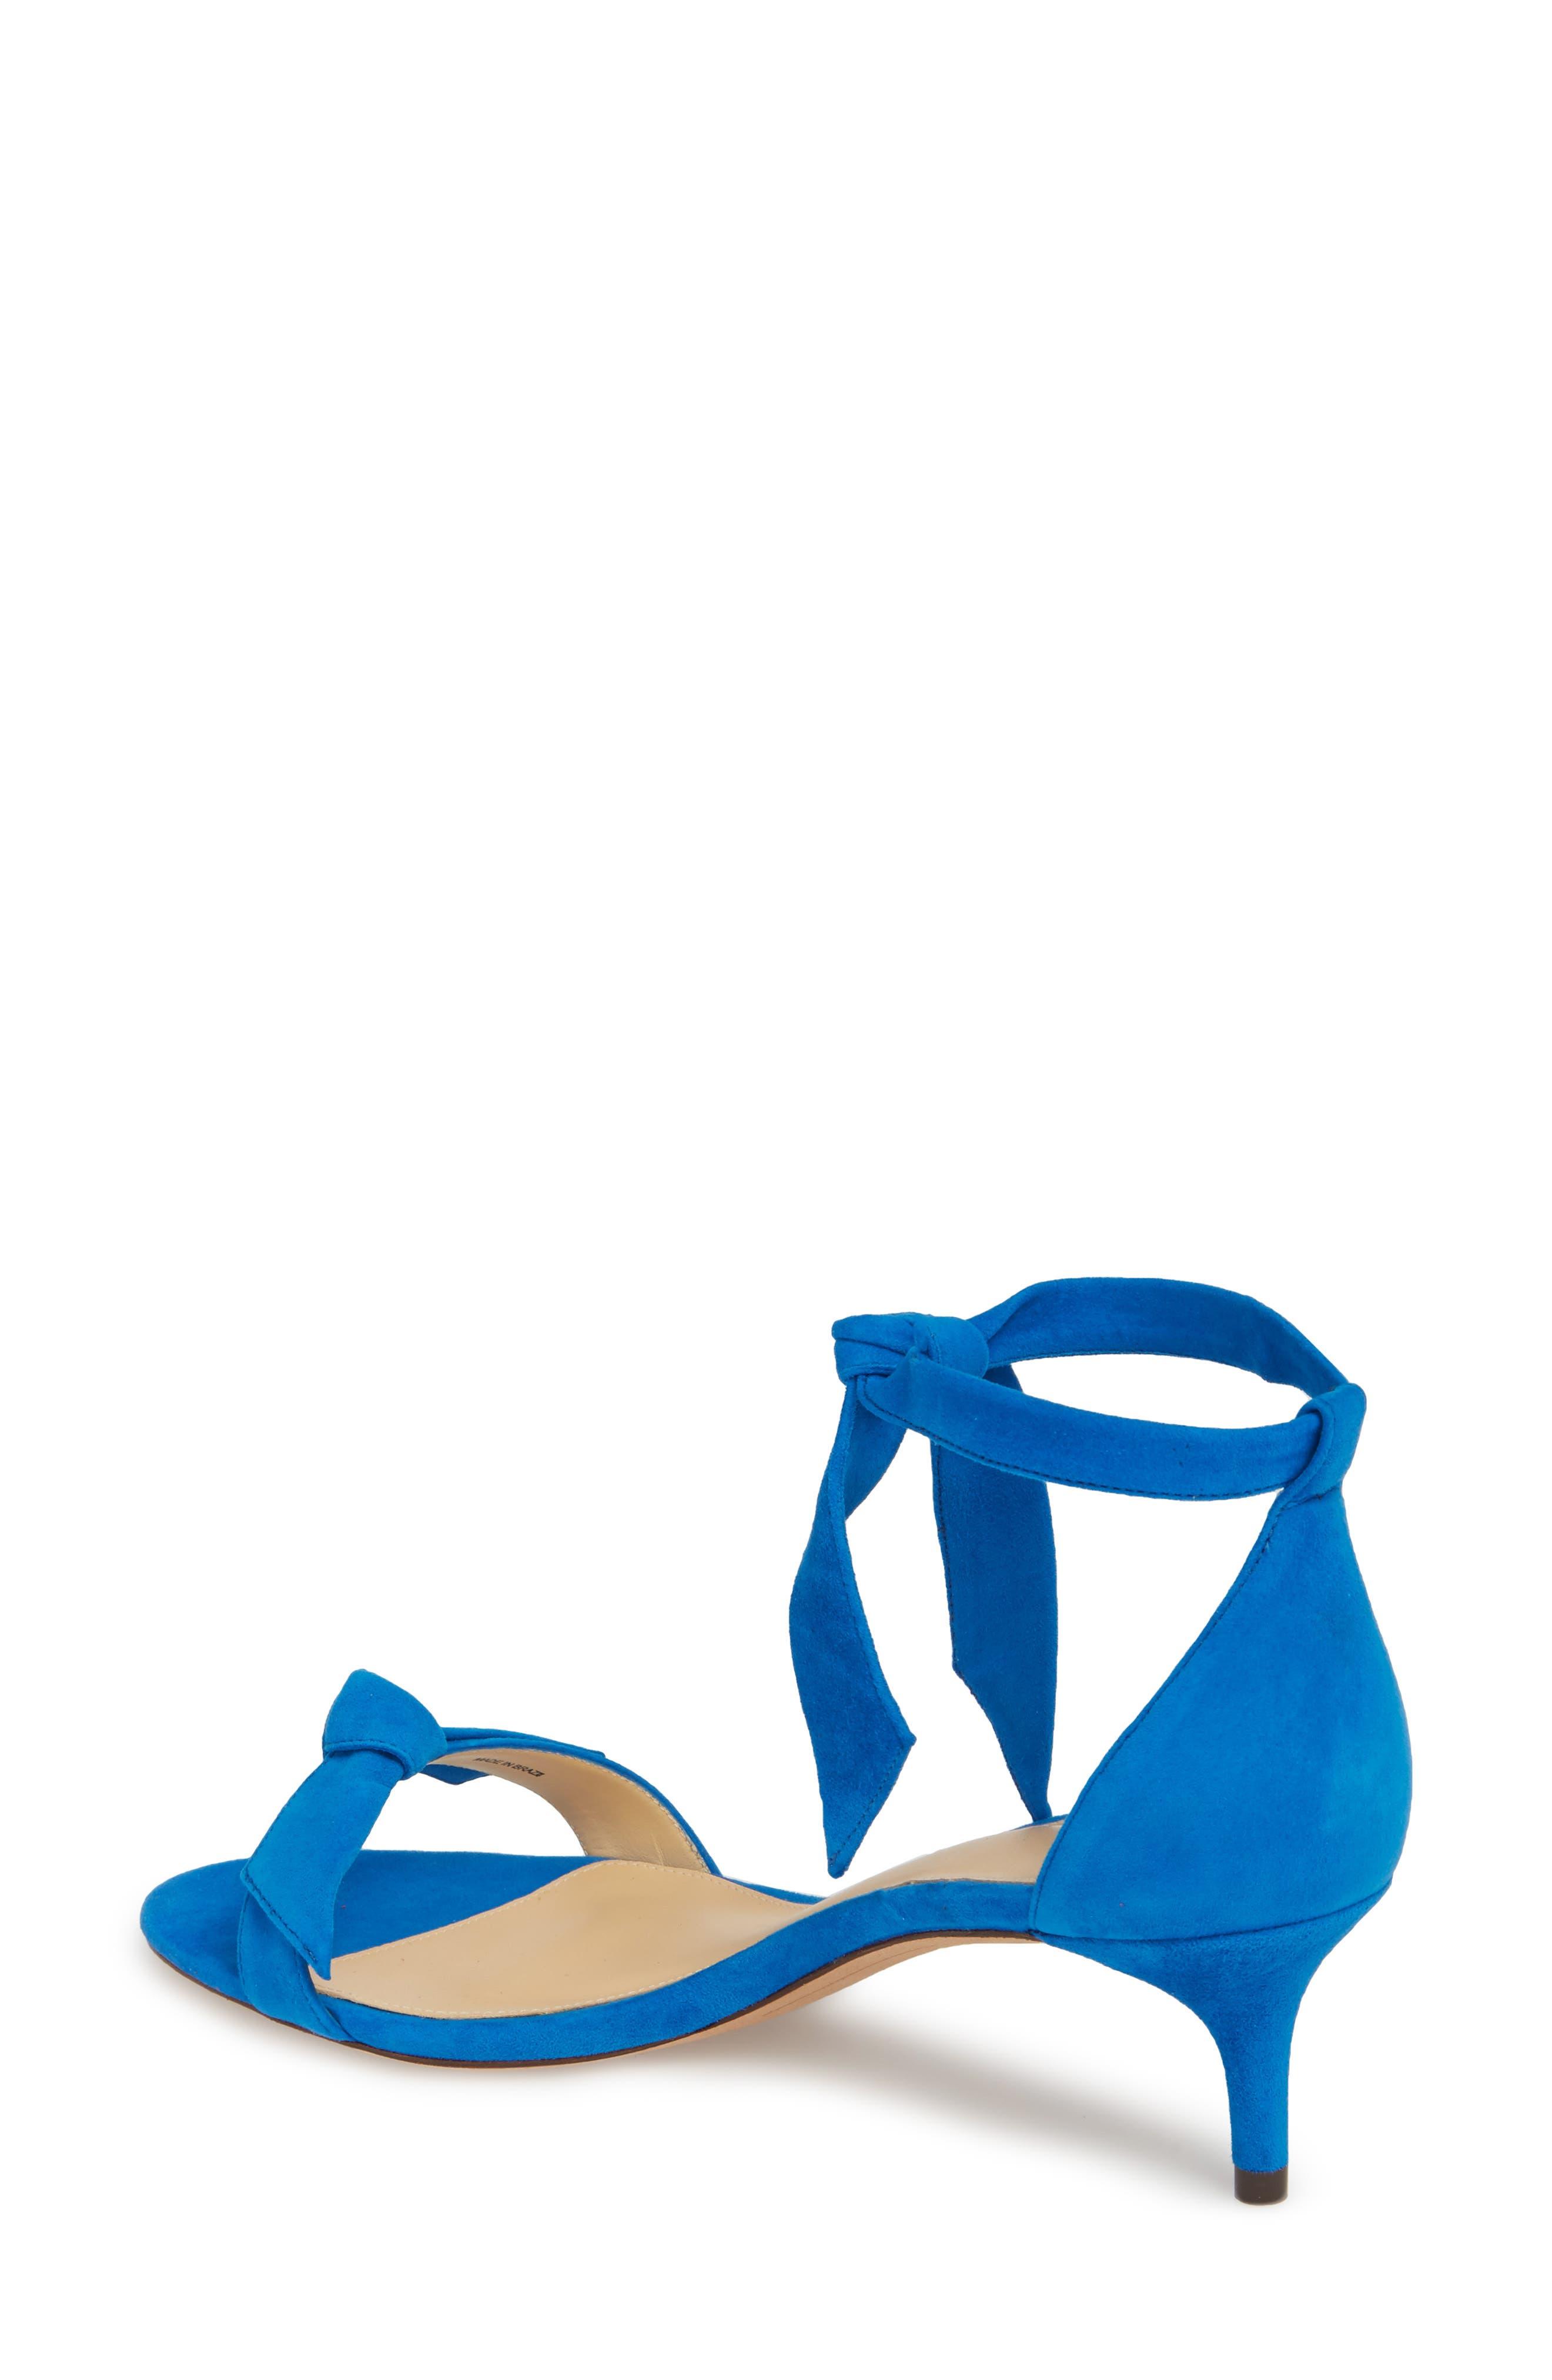 Clarita Knotted Sandal,                             Alternate thumbnail 2, color,                             400